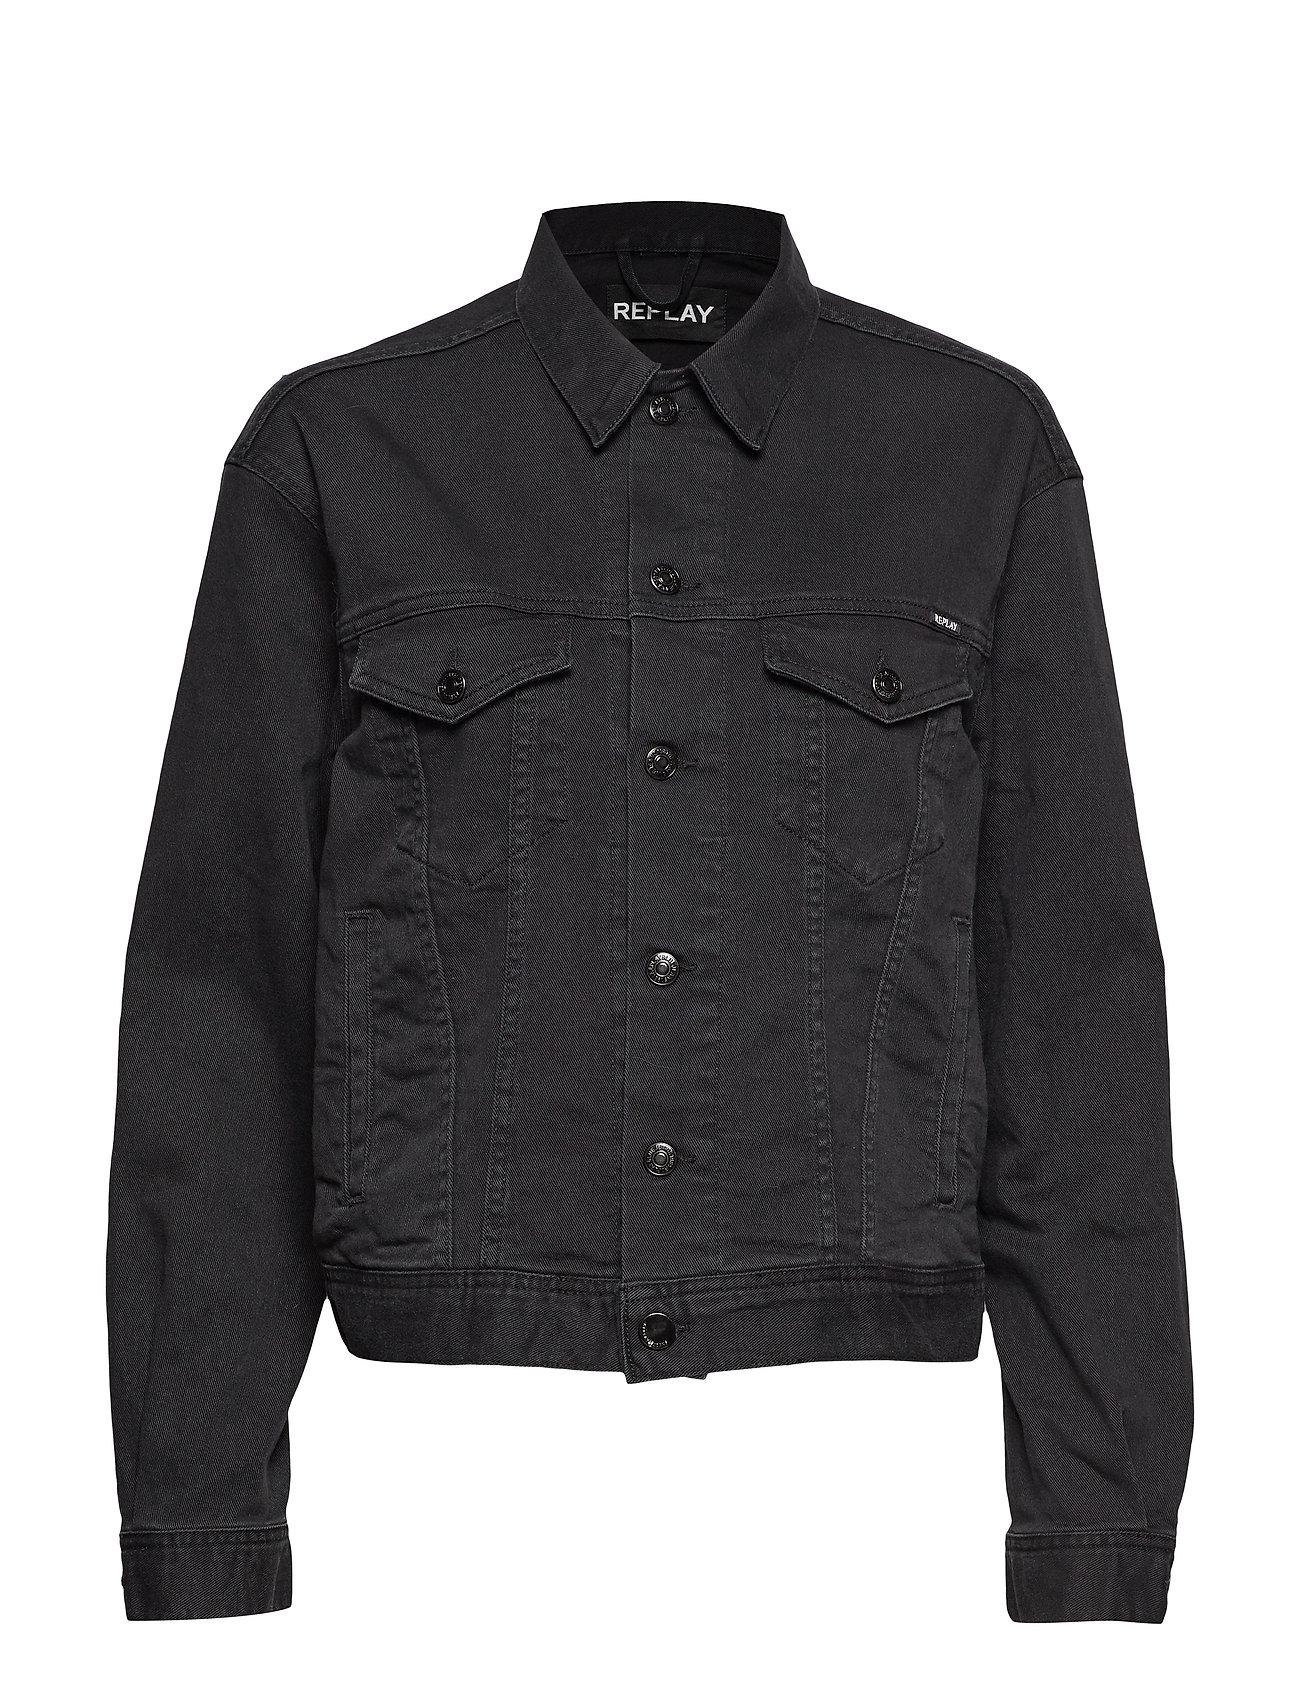 Replay Jacket - BLACK